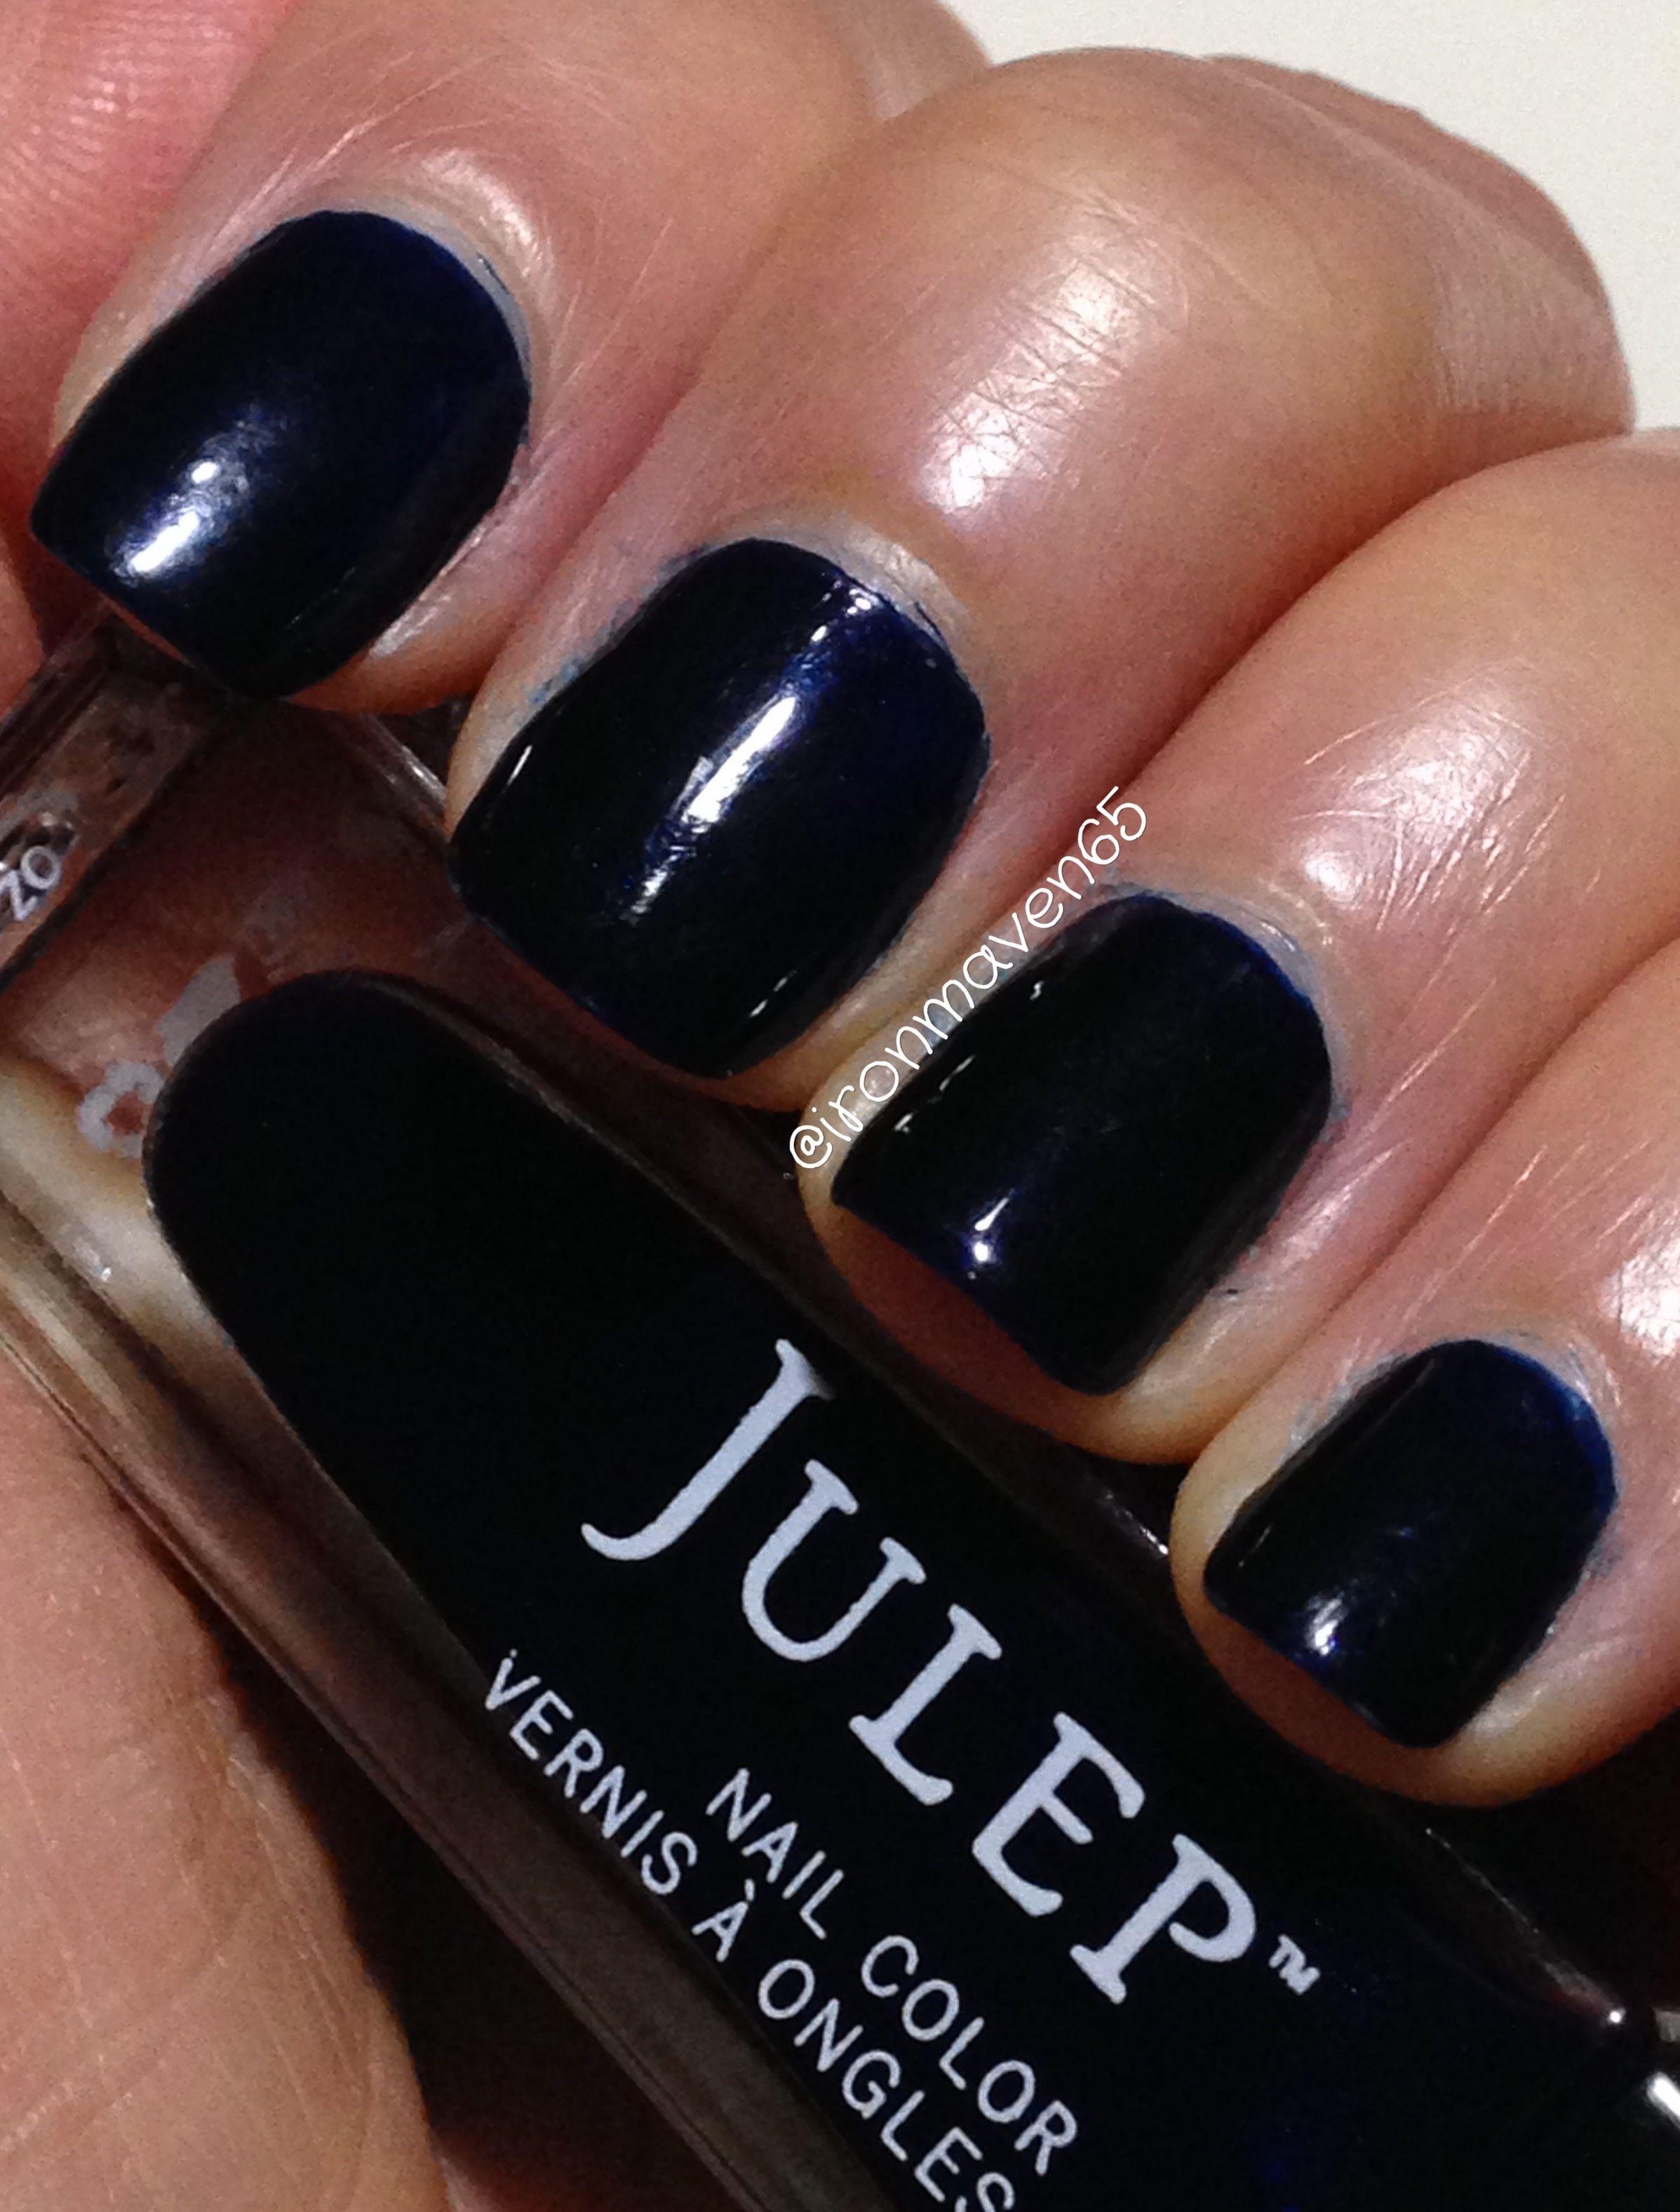 Julep Lolo Shell October 2016 Intense Indigo Ghost Shimmer Nail Polish Collection